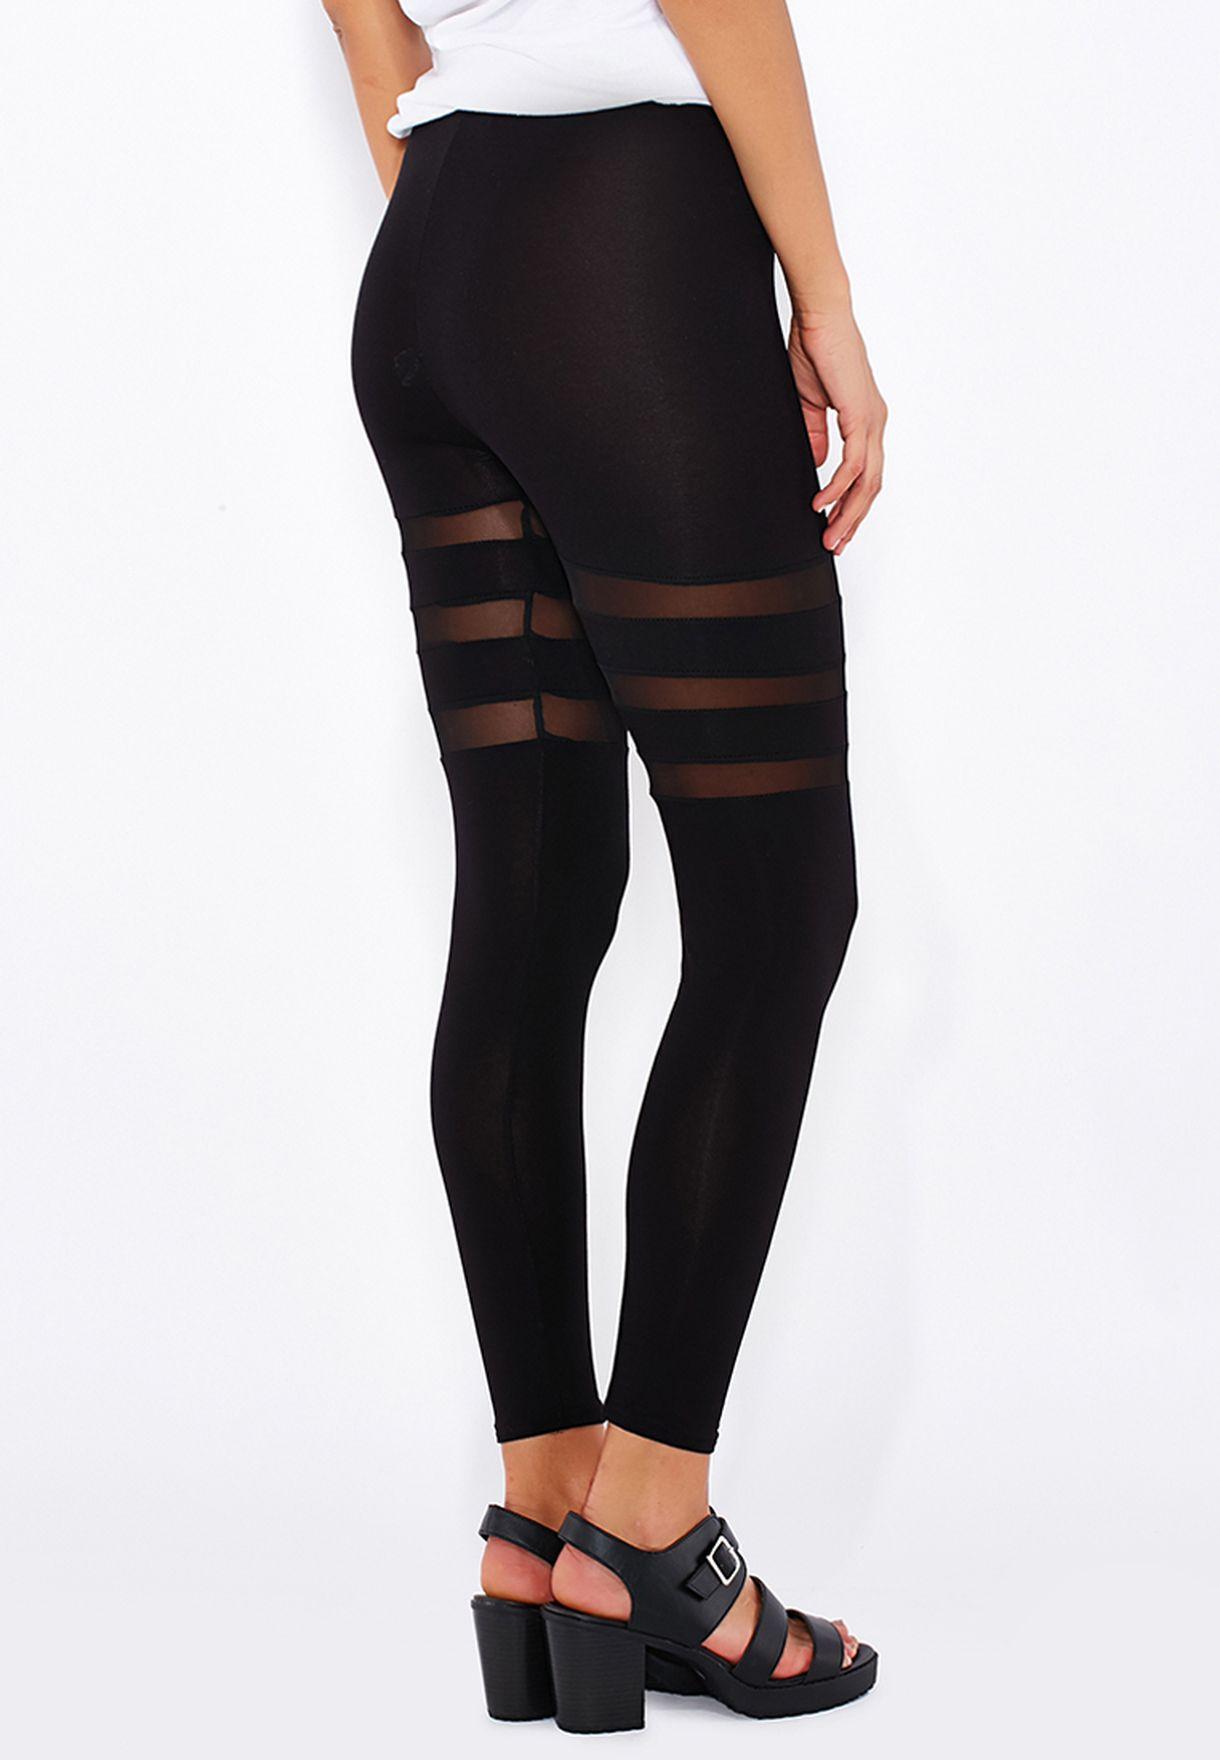 ced3b8c31053cf Shop Boohoo black Mesh Insert Wet Look Leggings AZZ10385 for Women ...